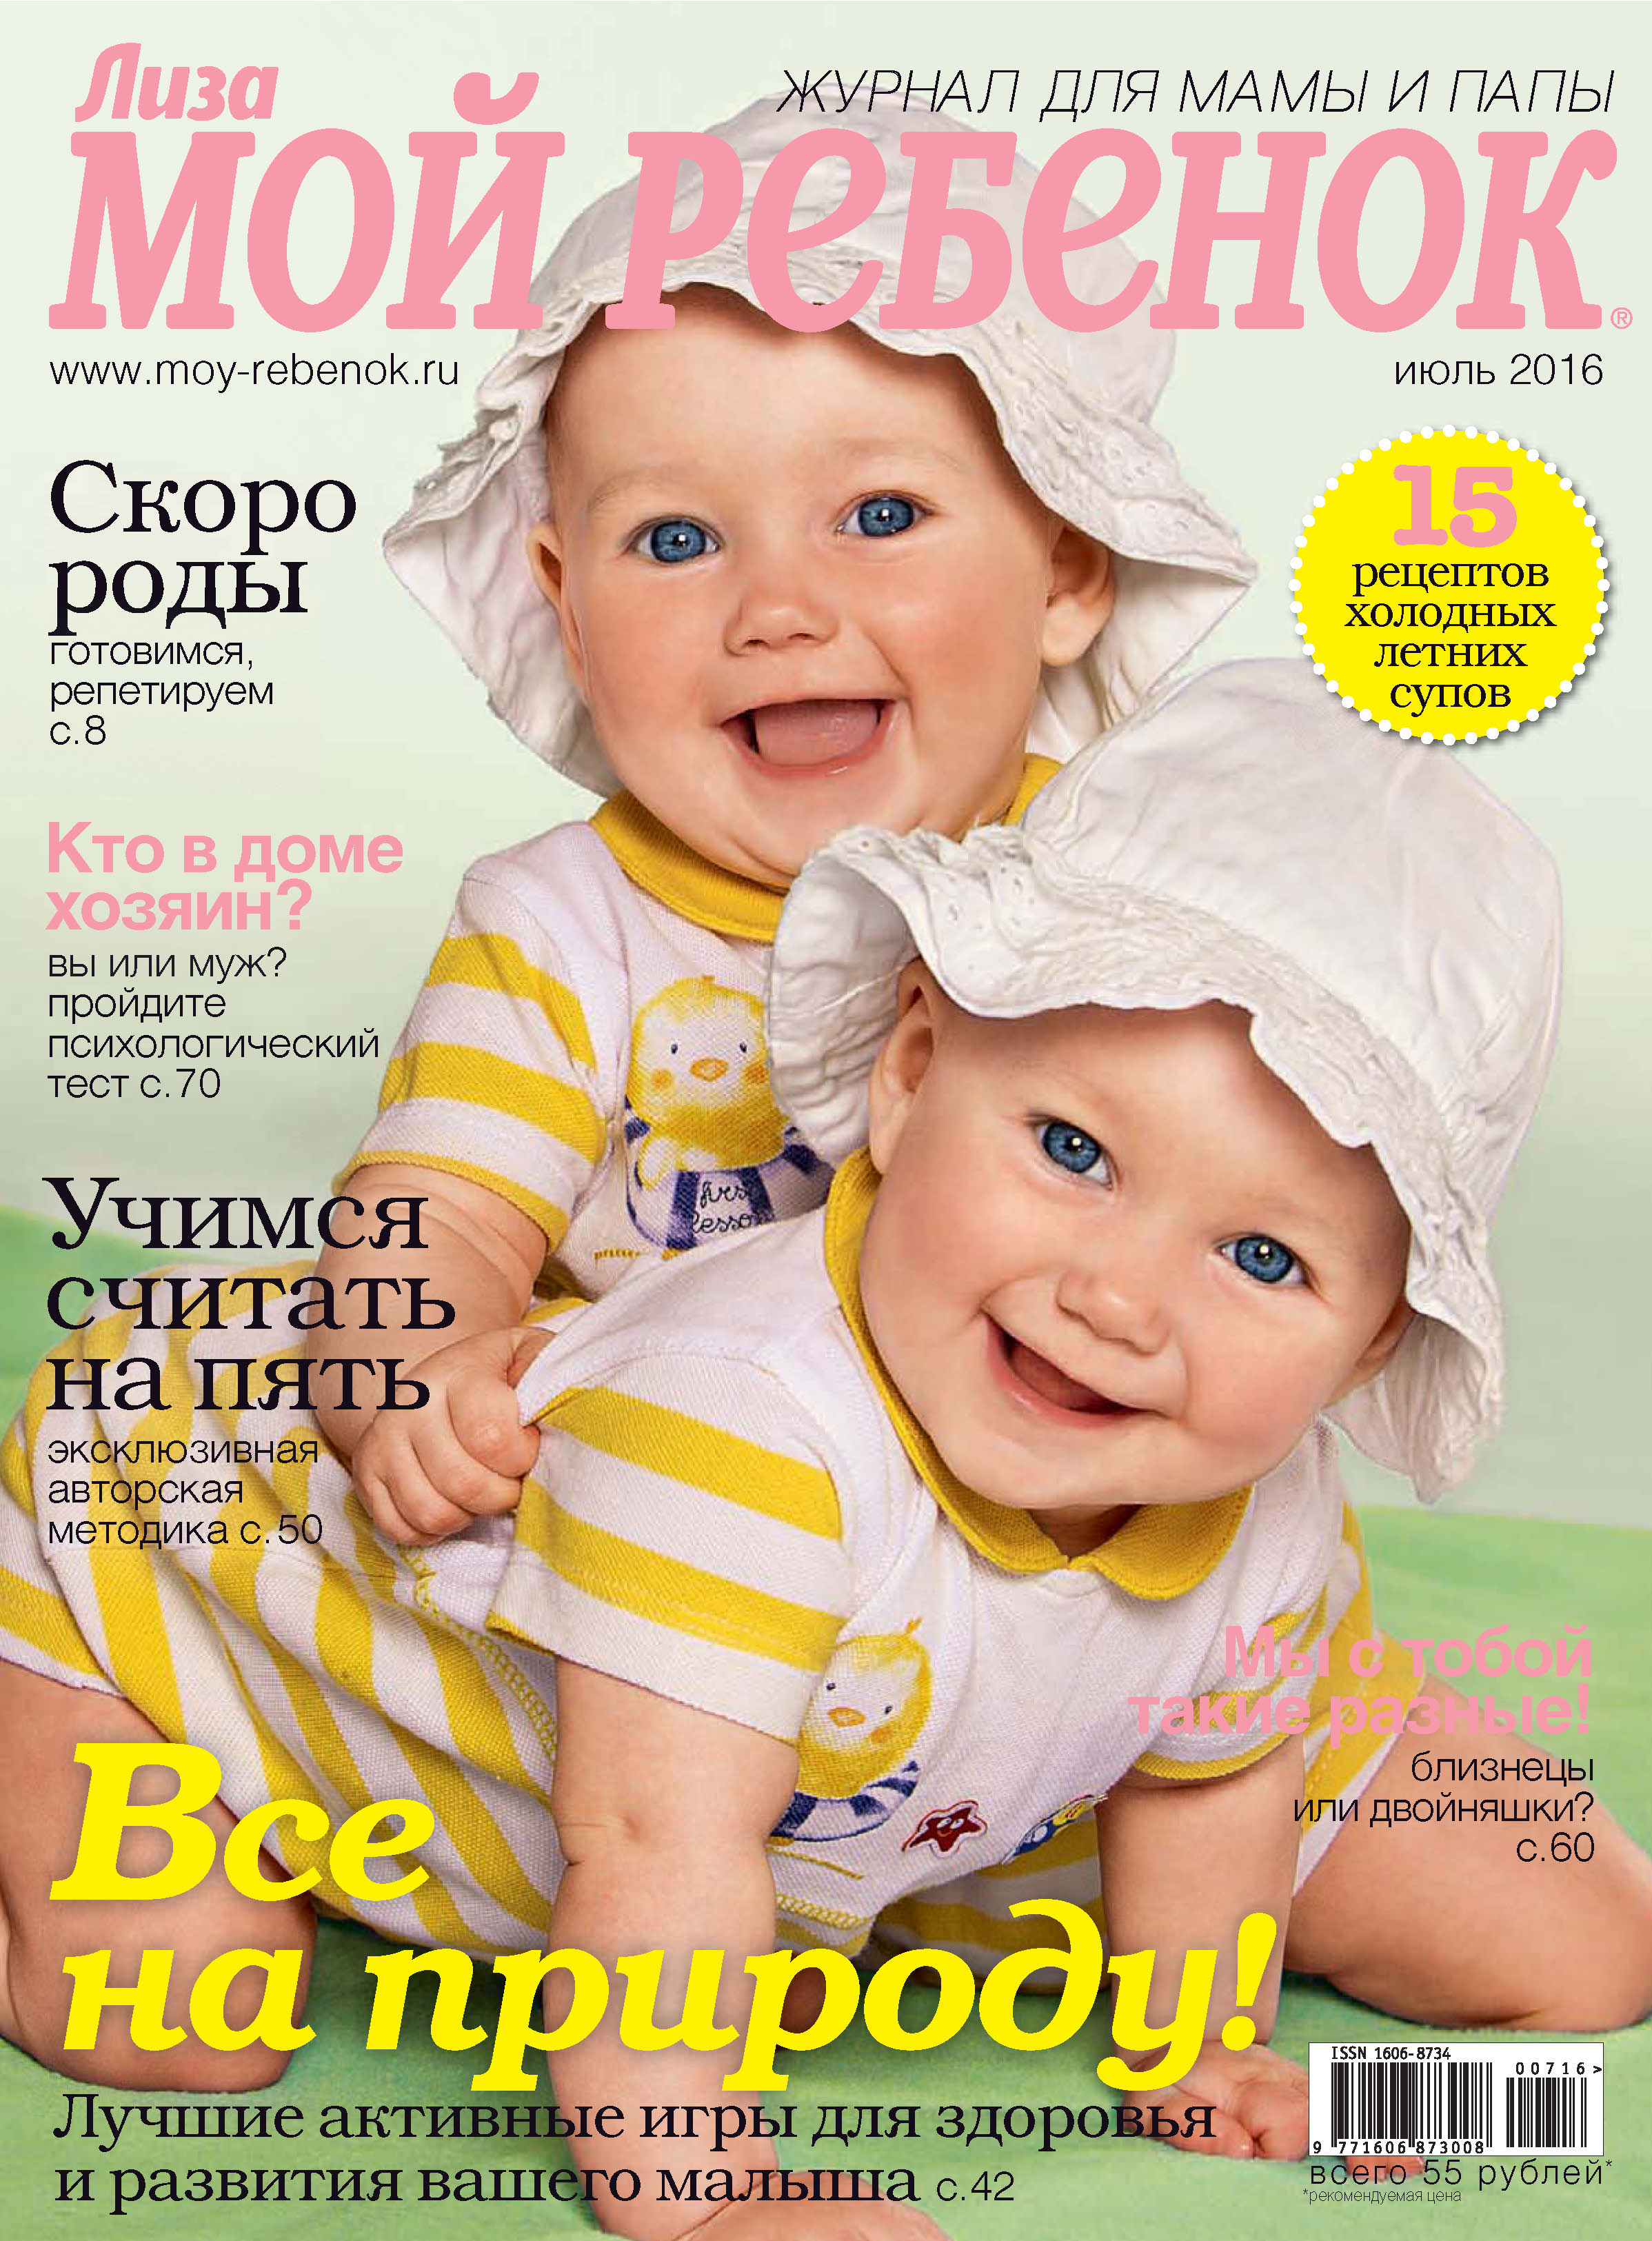 ИД «Бурда» Журнал «Лиза. Мой ребенок» №07/2016 ид бурда журнал лиза мой ребенок 03 2014